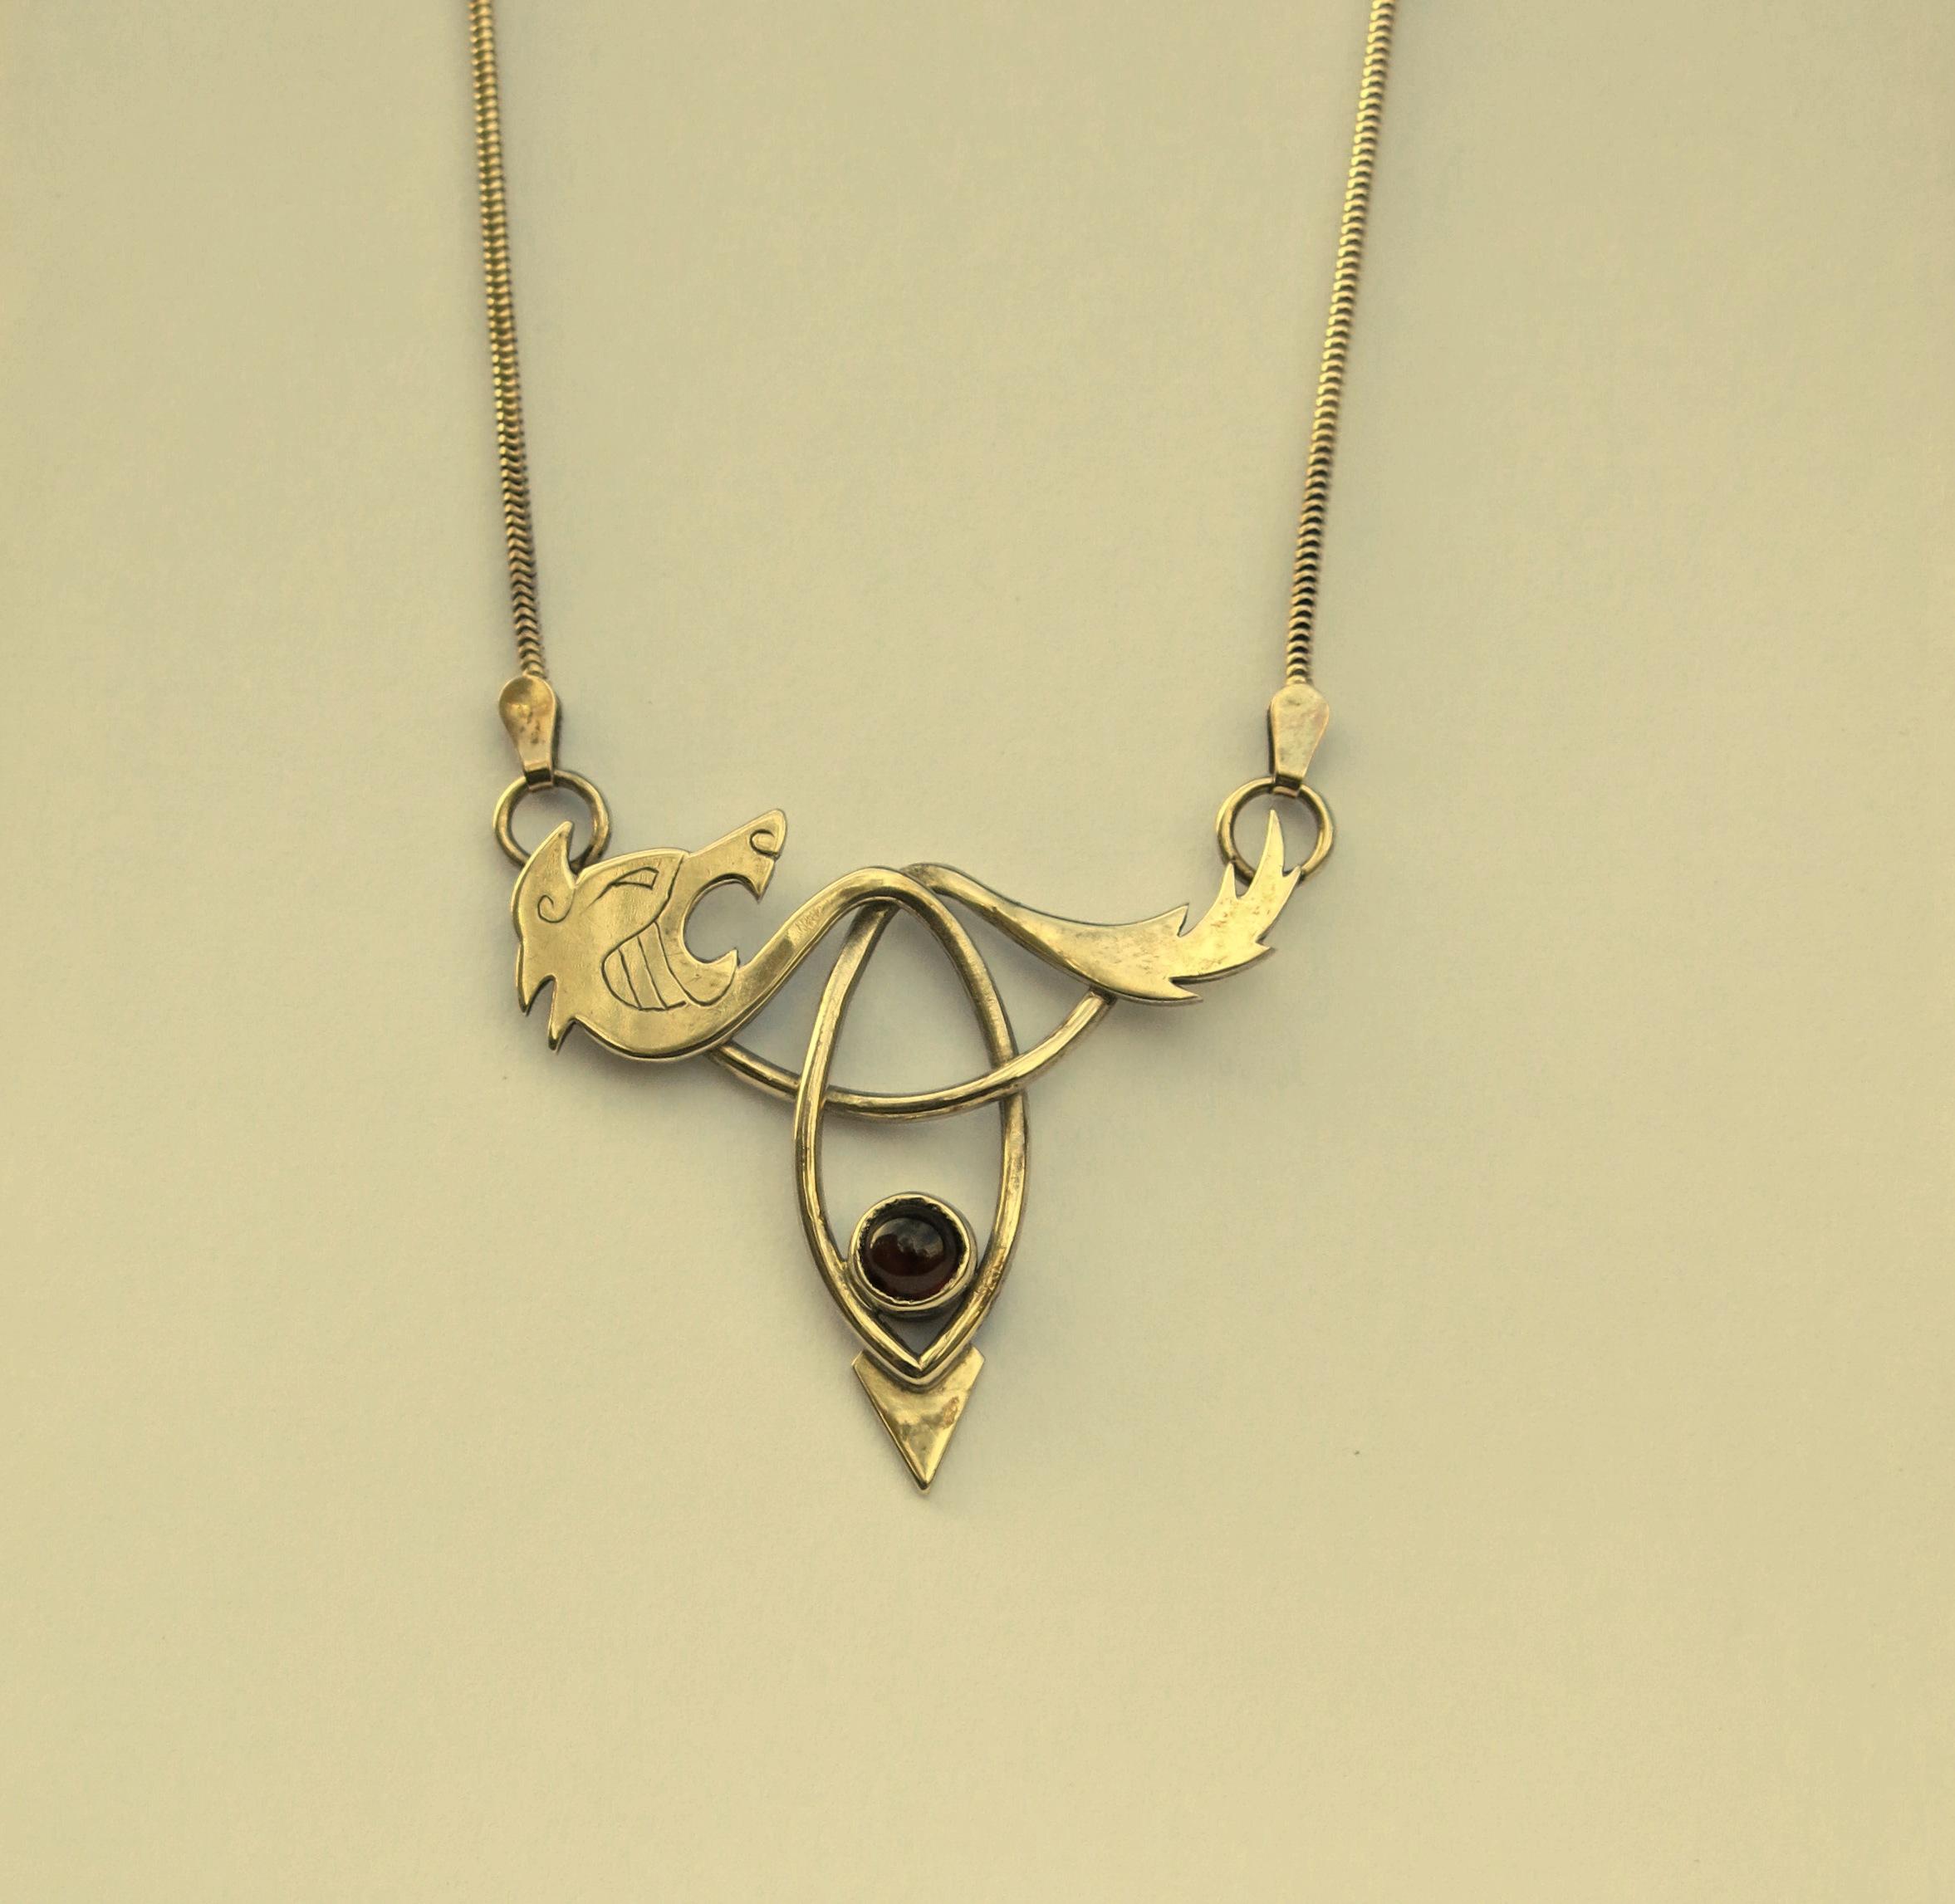 Wild beast with garnet pendant